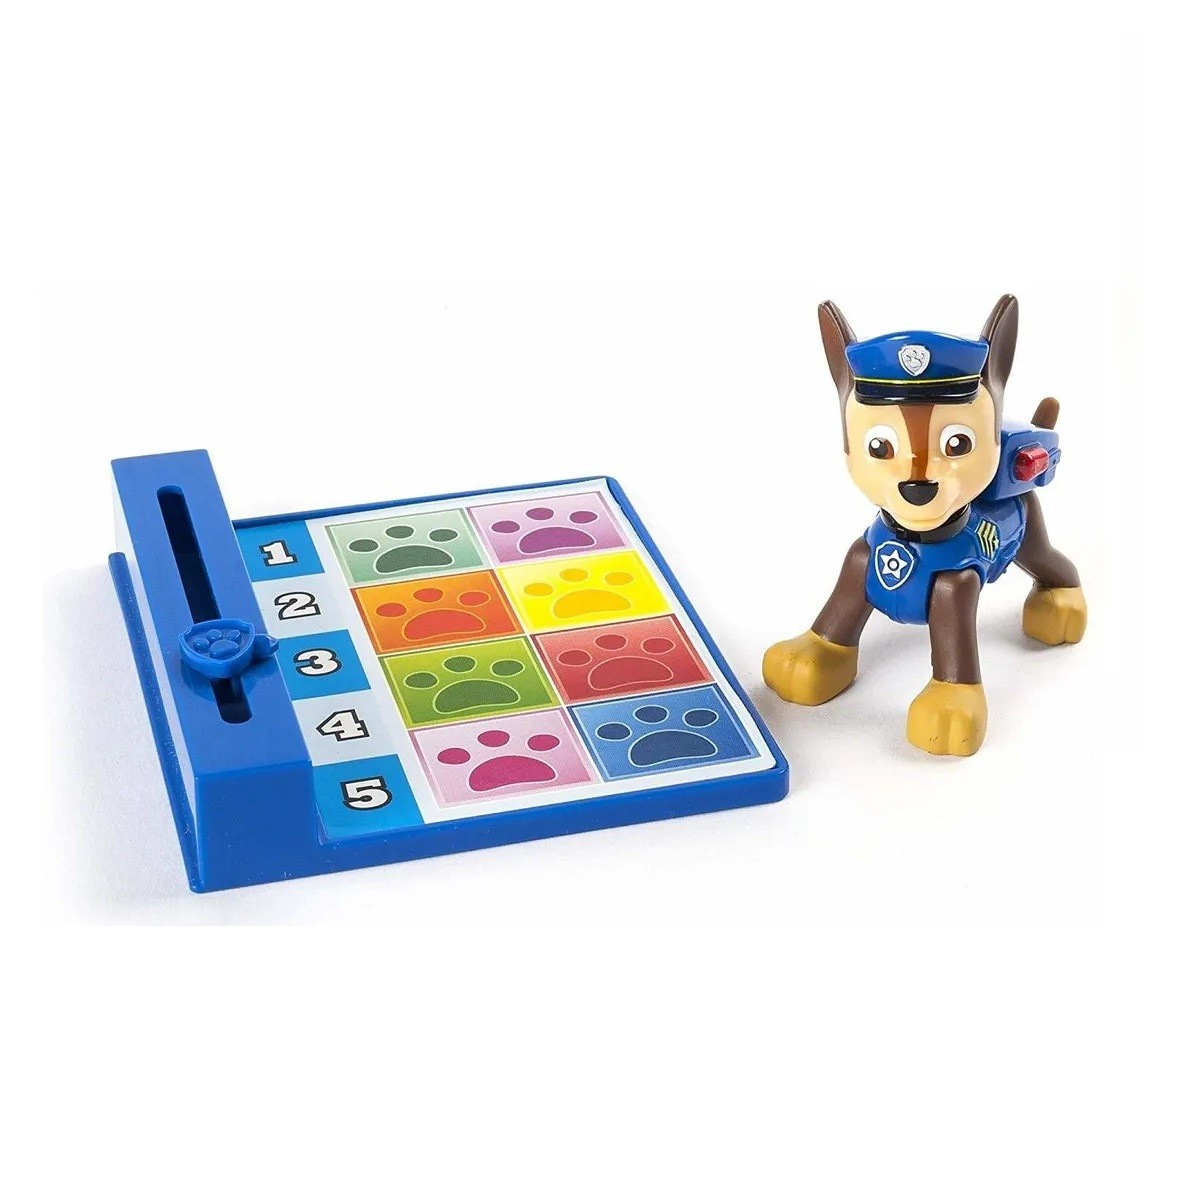 Brinquedo Infantil Cachorrinho BACK FLIP PATRULHA CANINA